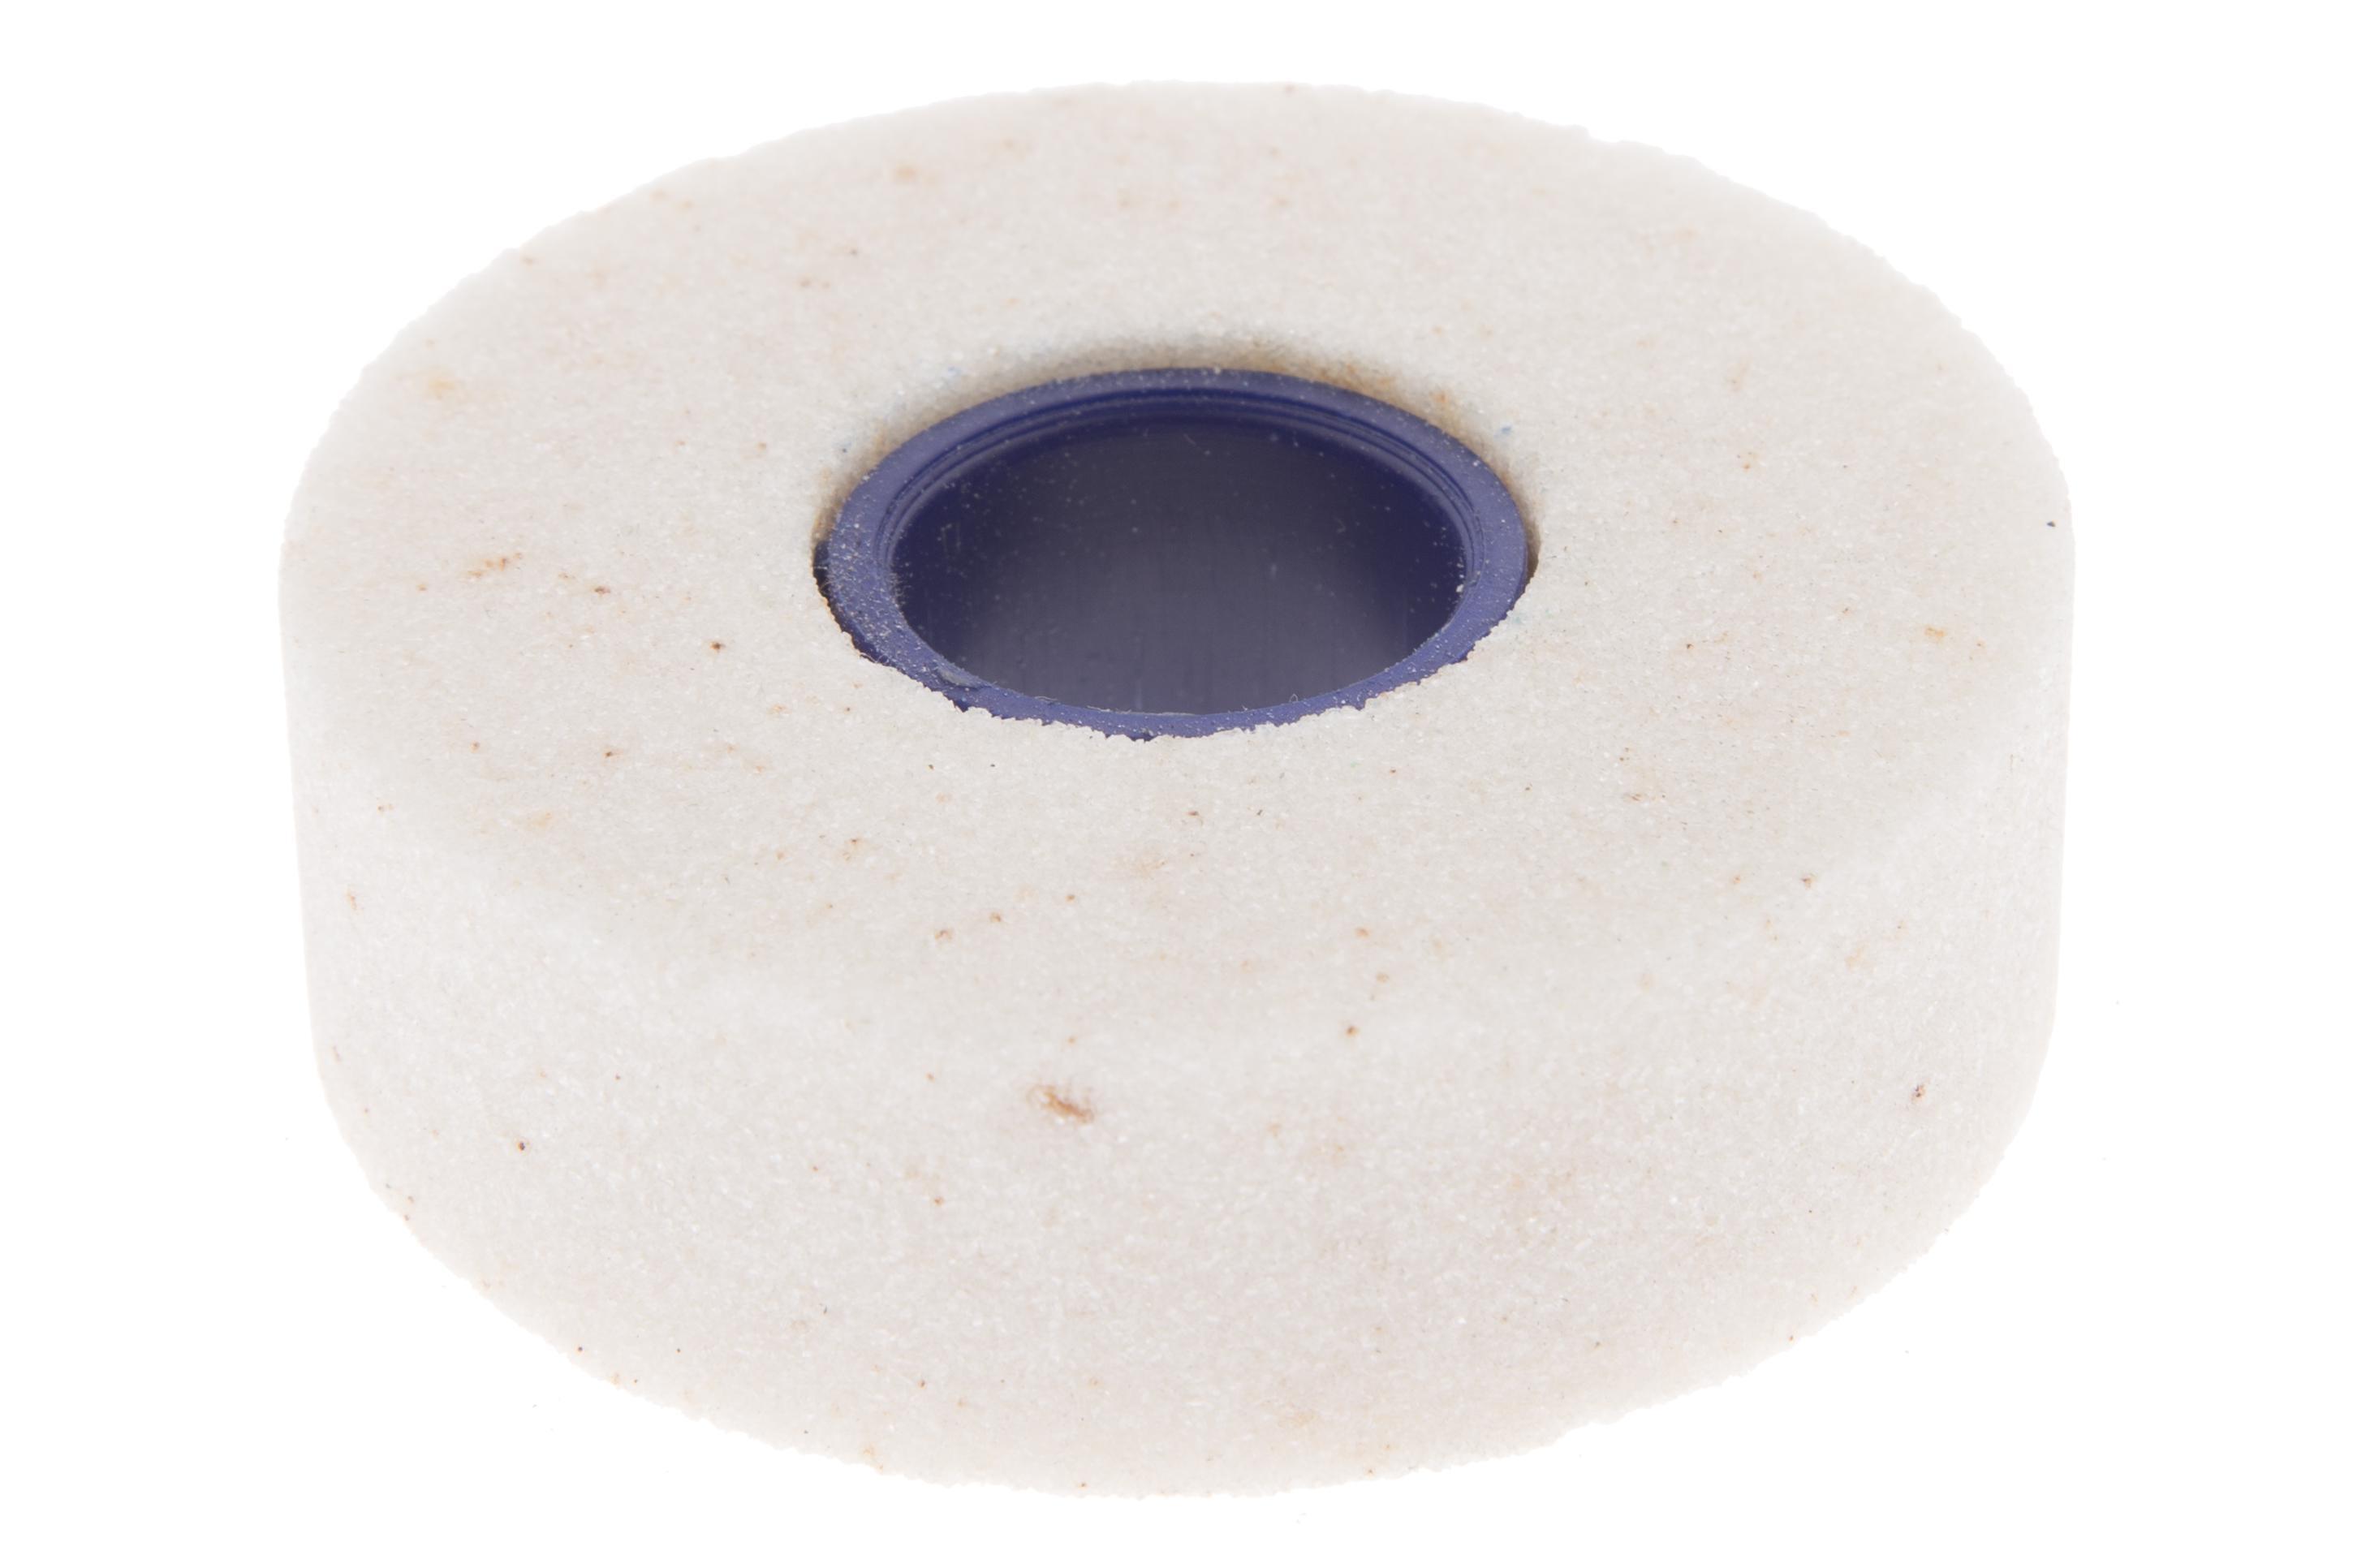 Круг шлифовальный ЛУГА-АБРАЗИВ 1 63 Х 20 Х 20 25А 40 k,l (40СМ) ваза mughal l 20 х 20 х 30 см